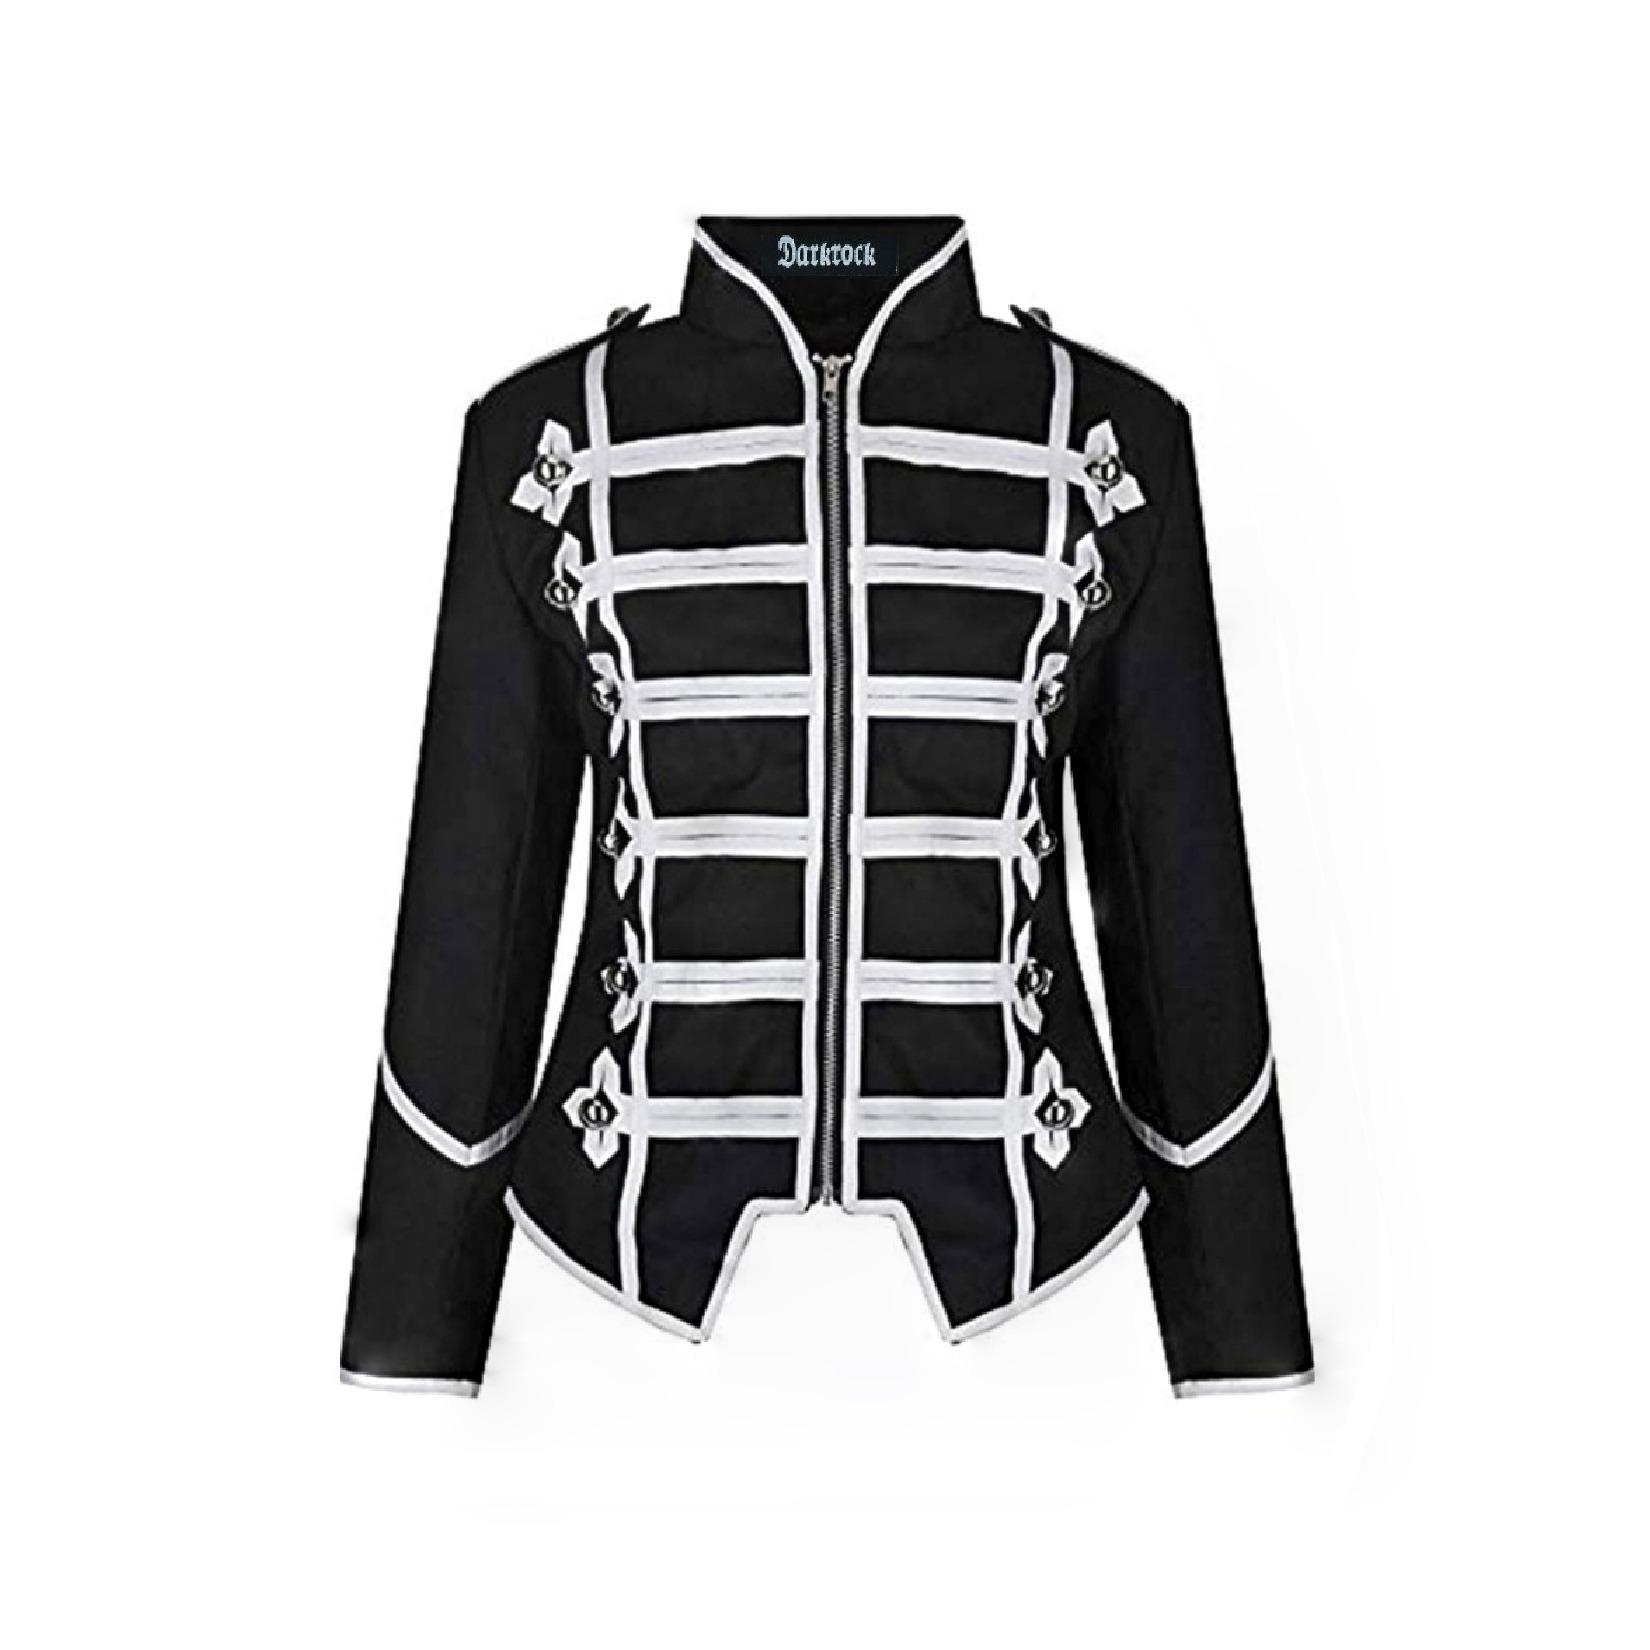 Women's Black Silver Parade Ladies Jacket (1)